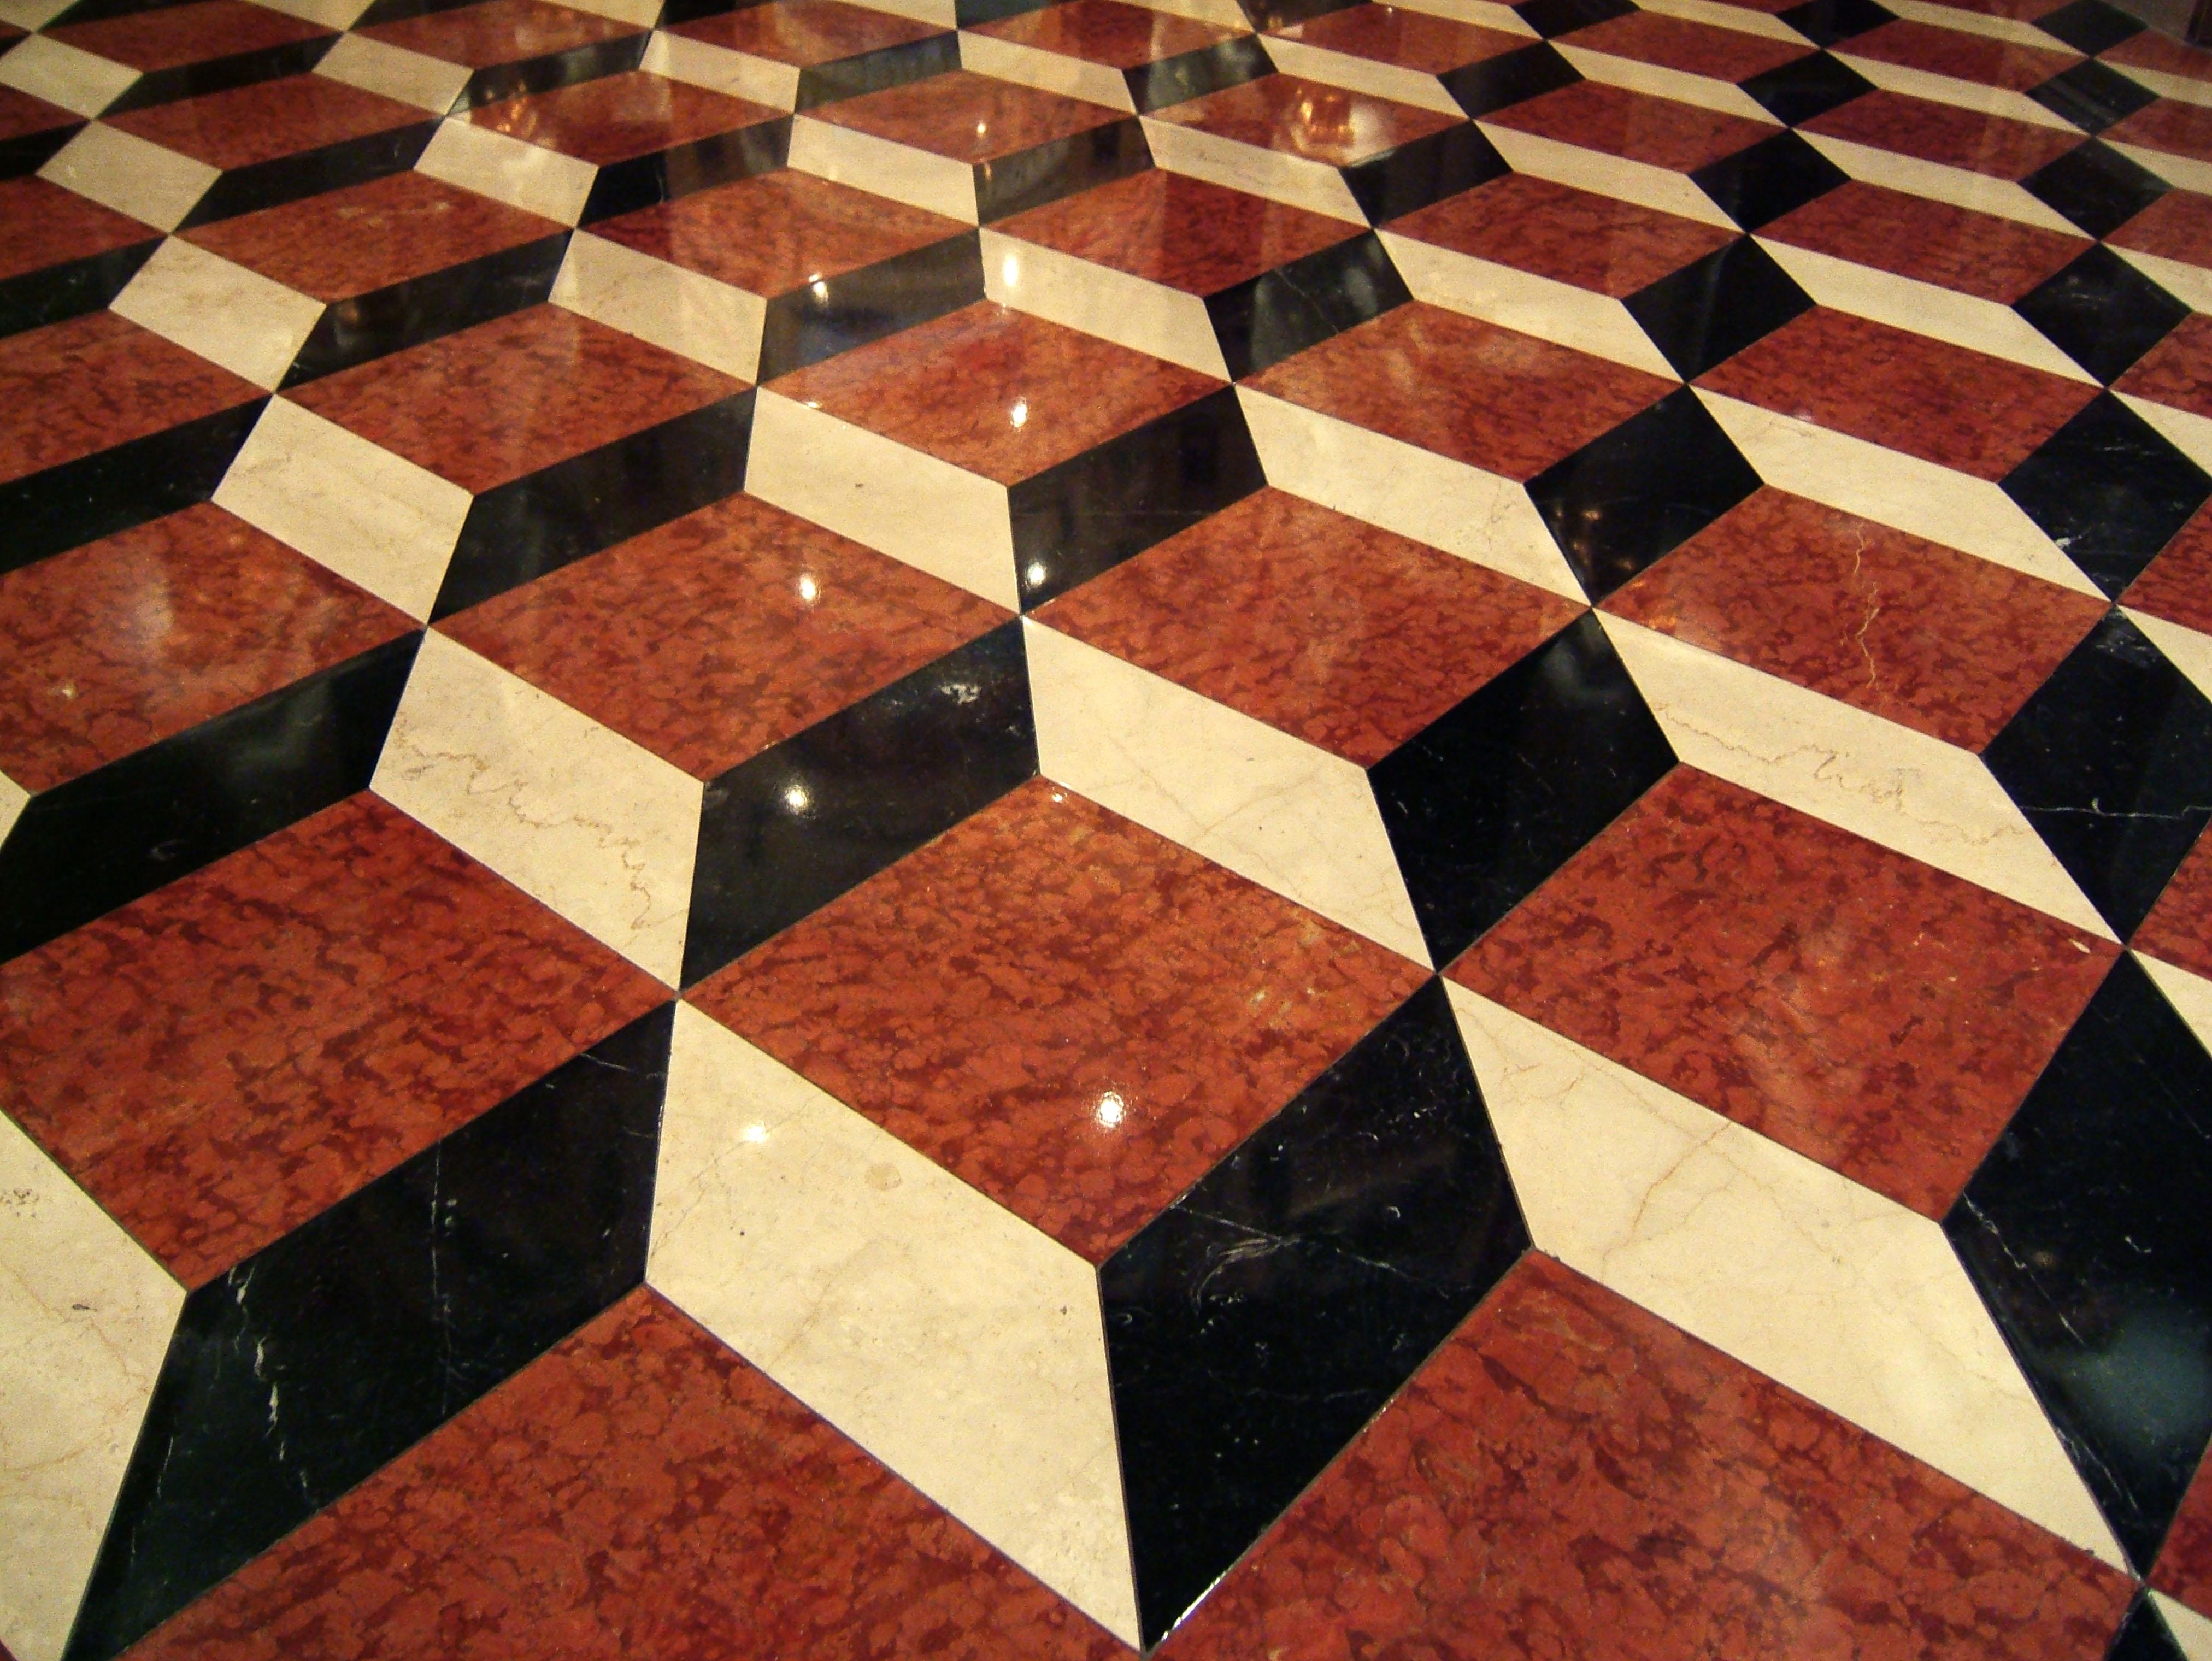 Textures Stonework Tile Patterns Los Vegas 01